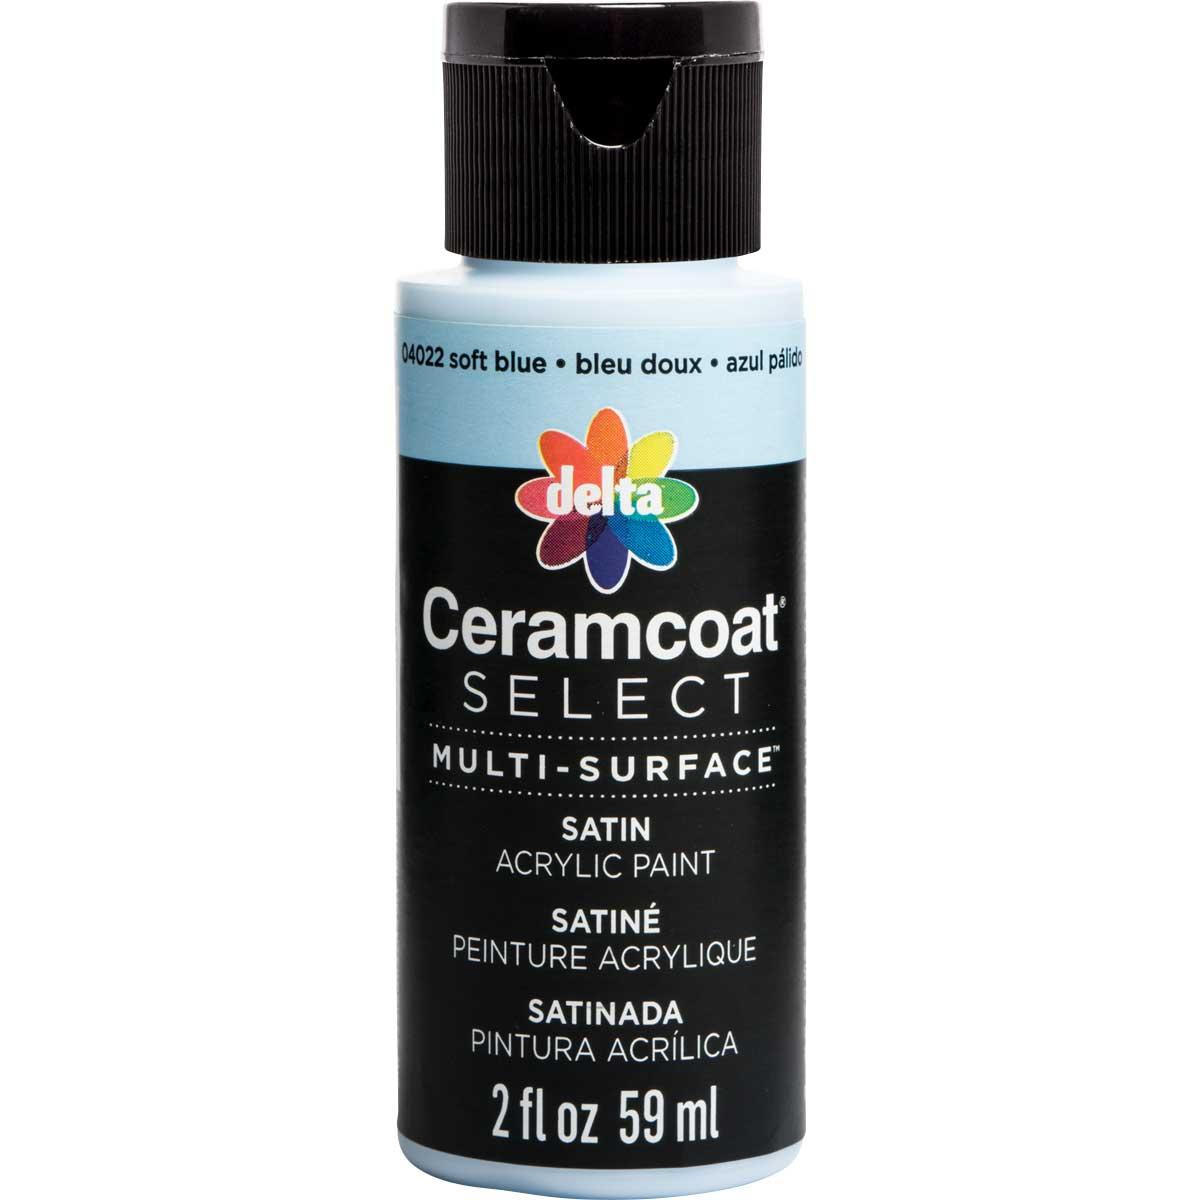 Delta Ceramcoat ® Select Multi-Surface Acrylic Paint - Satin - Soft Blue, 2 oz.